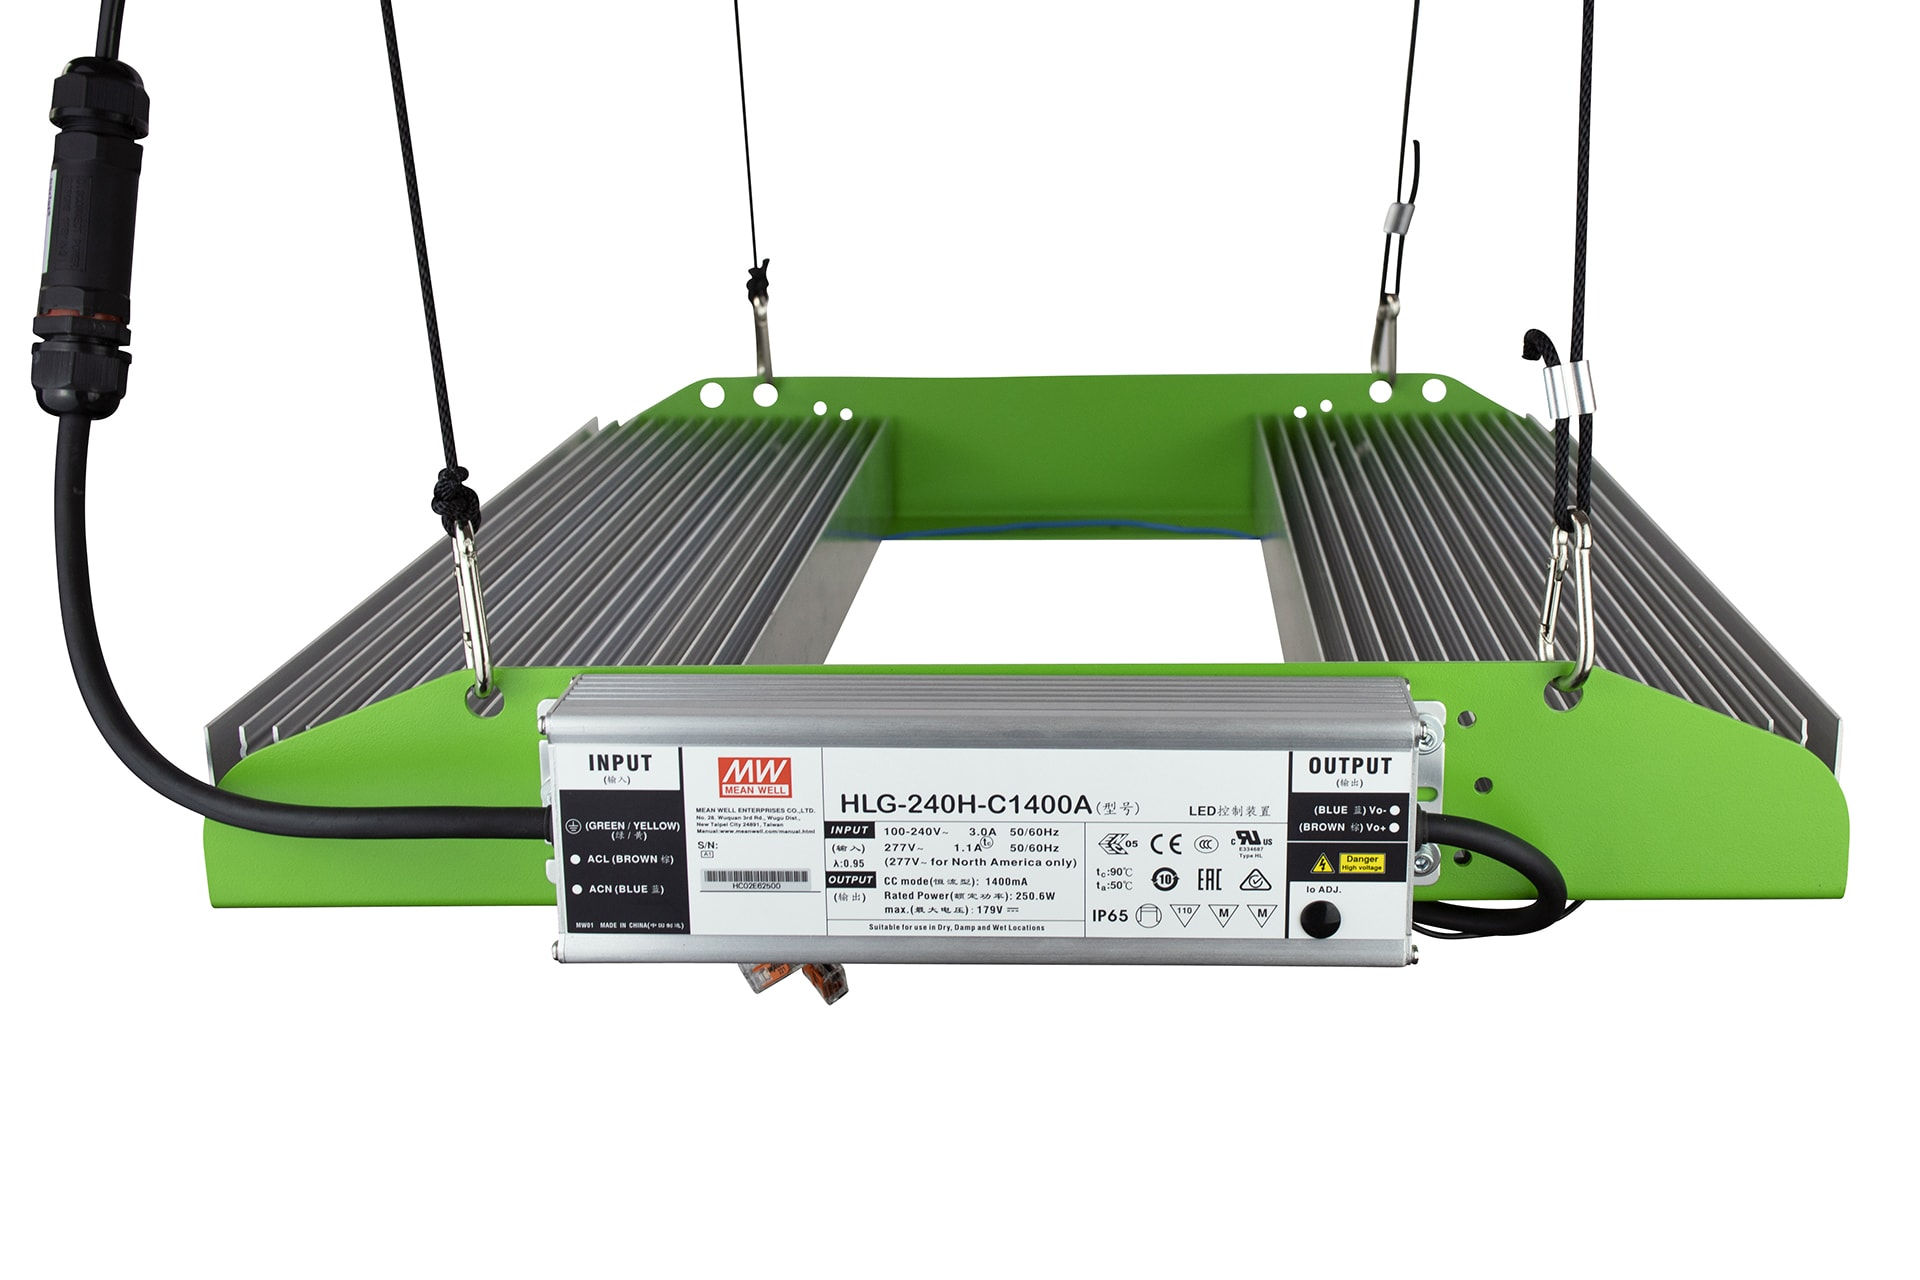 DIY-M-KIT-SMD-200w-quader-aufbau-top-down-pro-emit-onlineshop